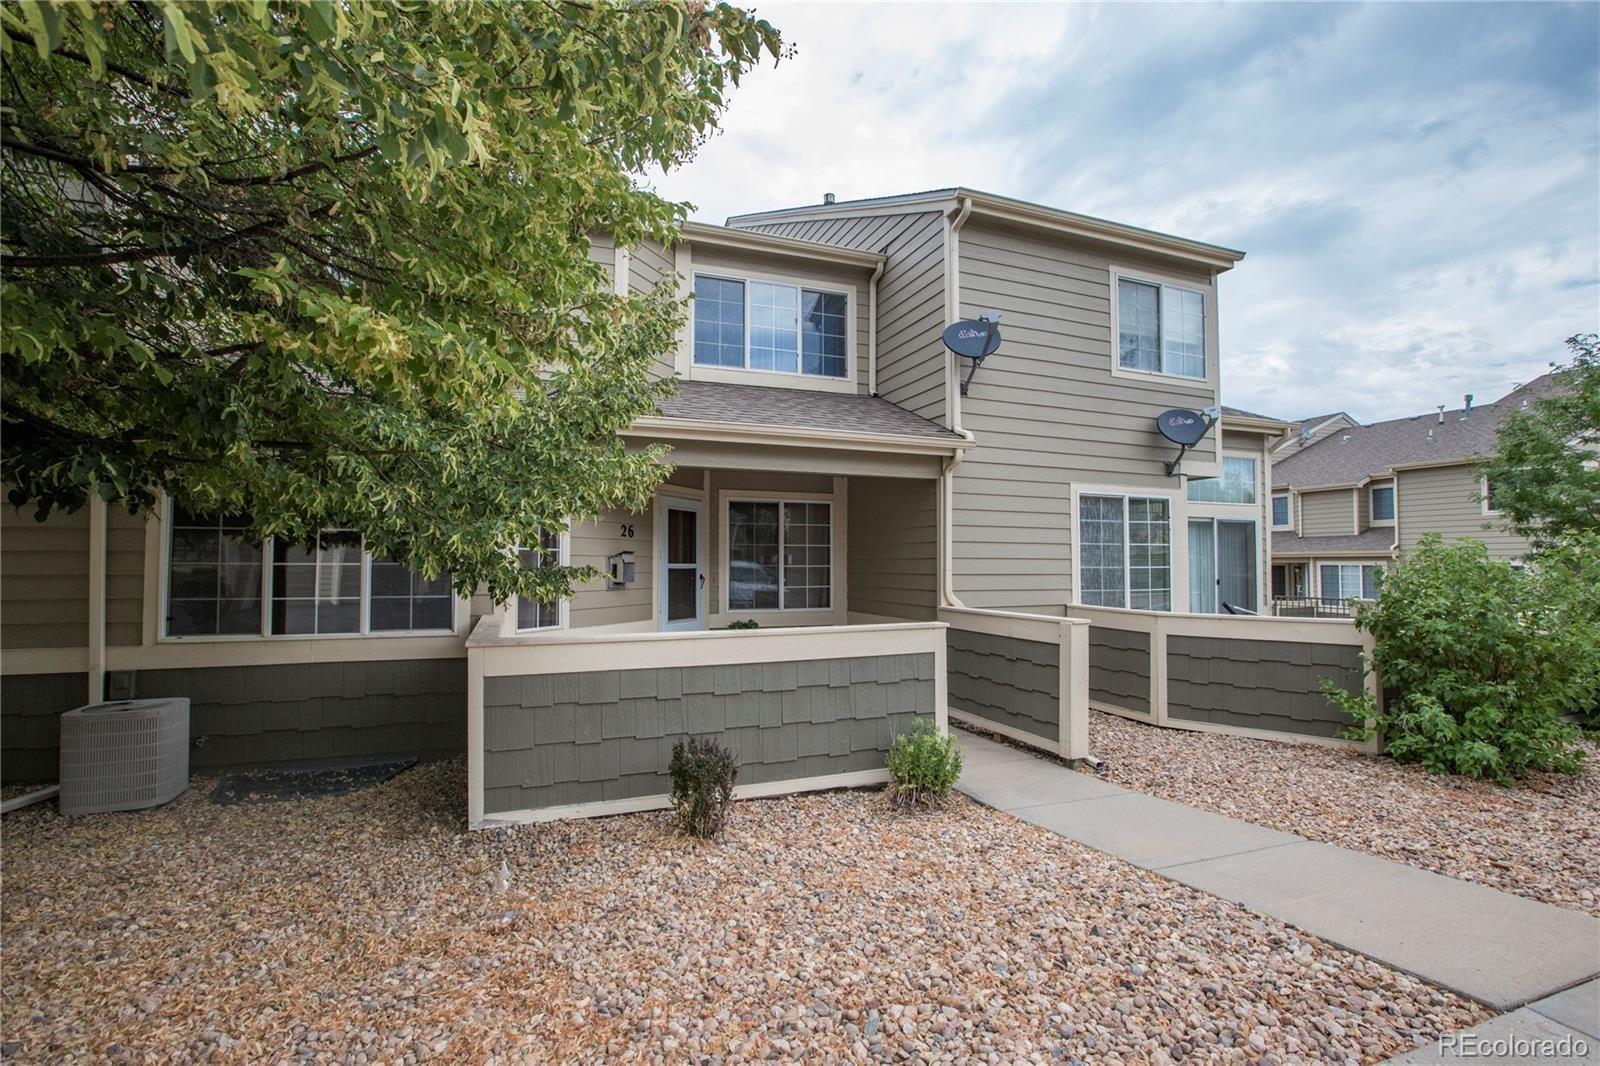 MLS# 3758449 - 2 - 6802 Antigua Drive #26, Fort Collins, CO 80525